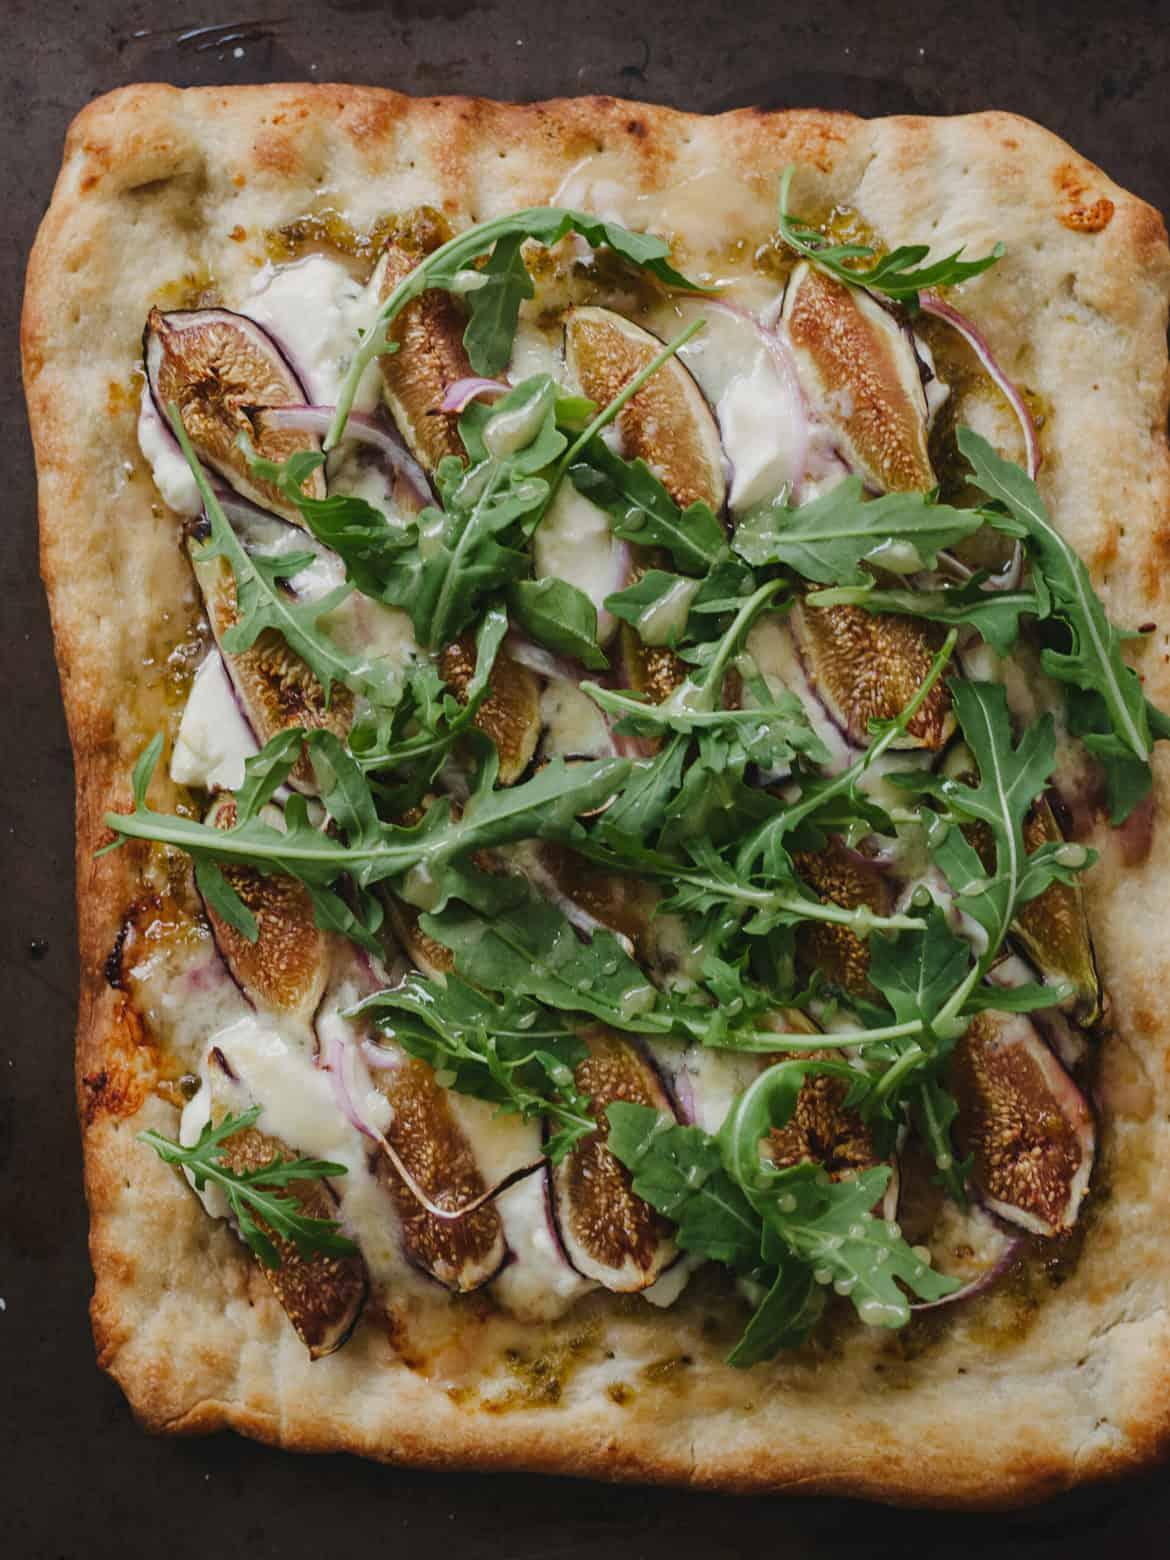 A homemade Fig, Jalapeño Jam & Blue Cheese Pizza topped with fresh arugula.